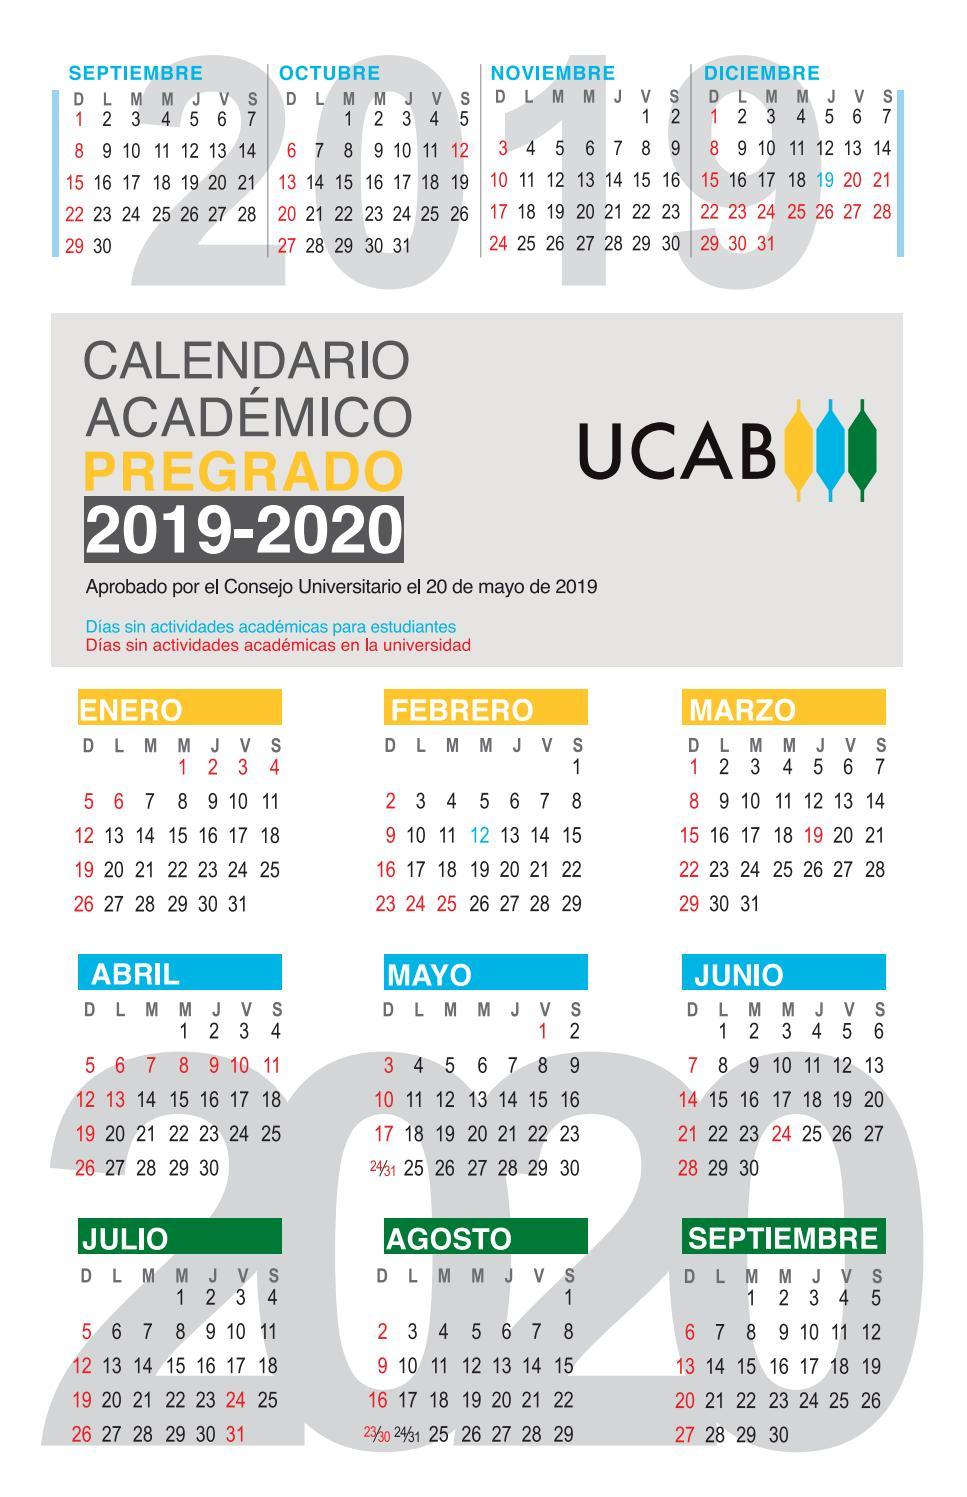 Agosto 2020 Calendario.Calendario Academico Pregrado 2019 2020 Ucab By Ucab Caracas